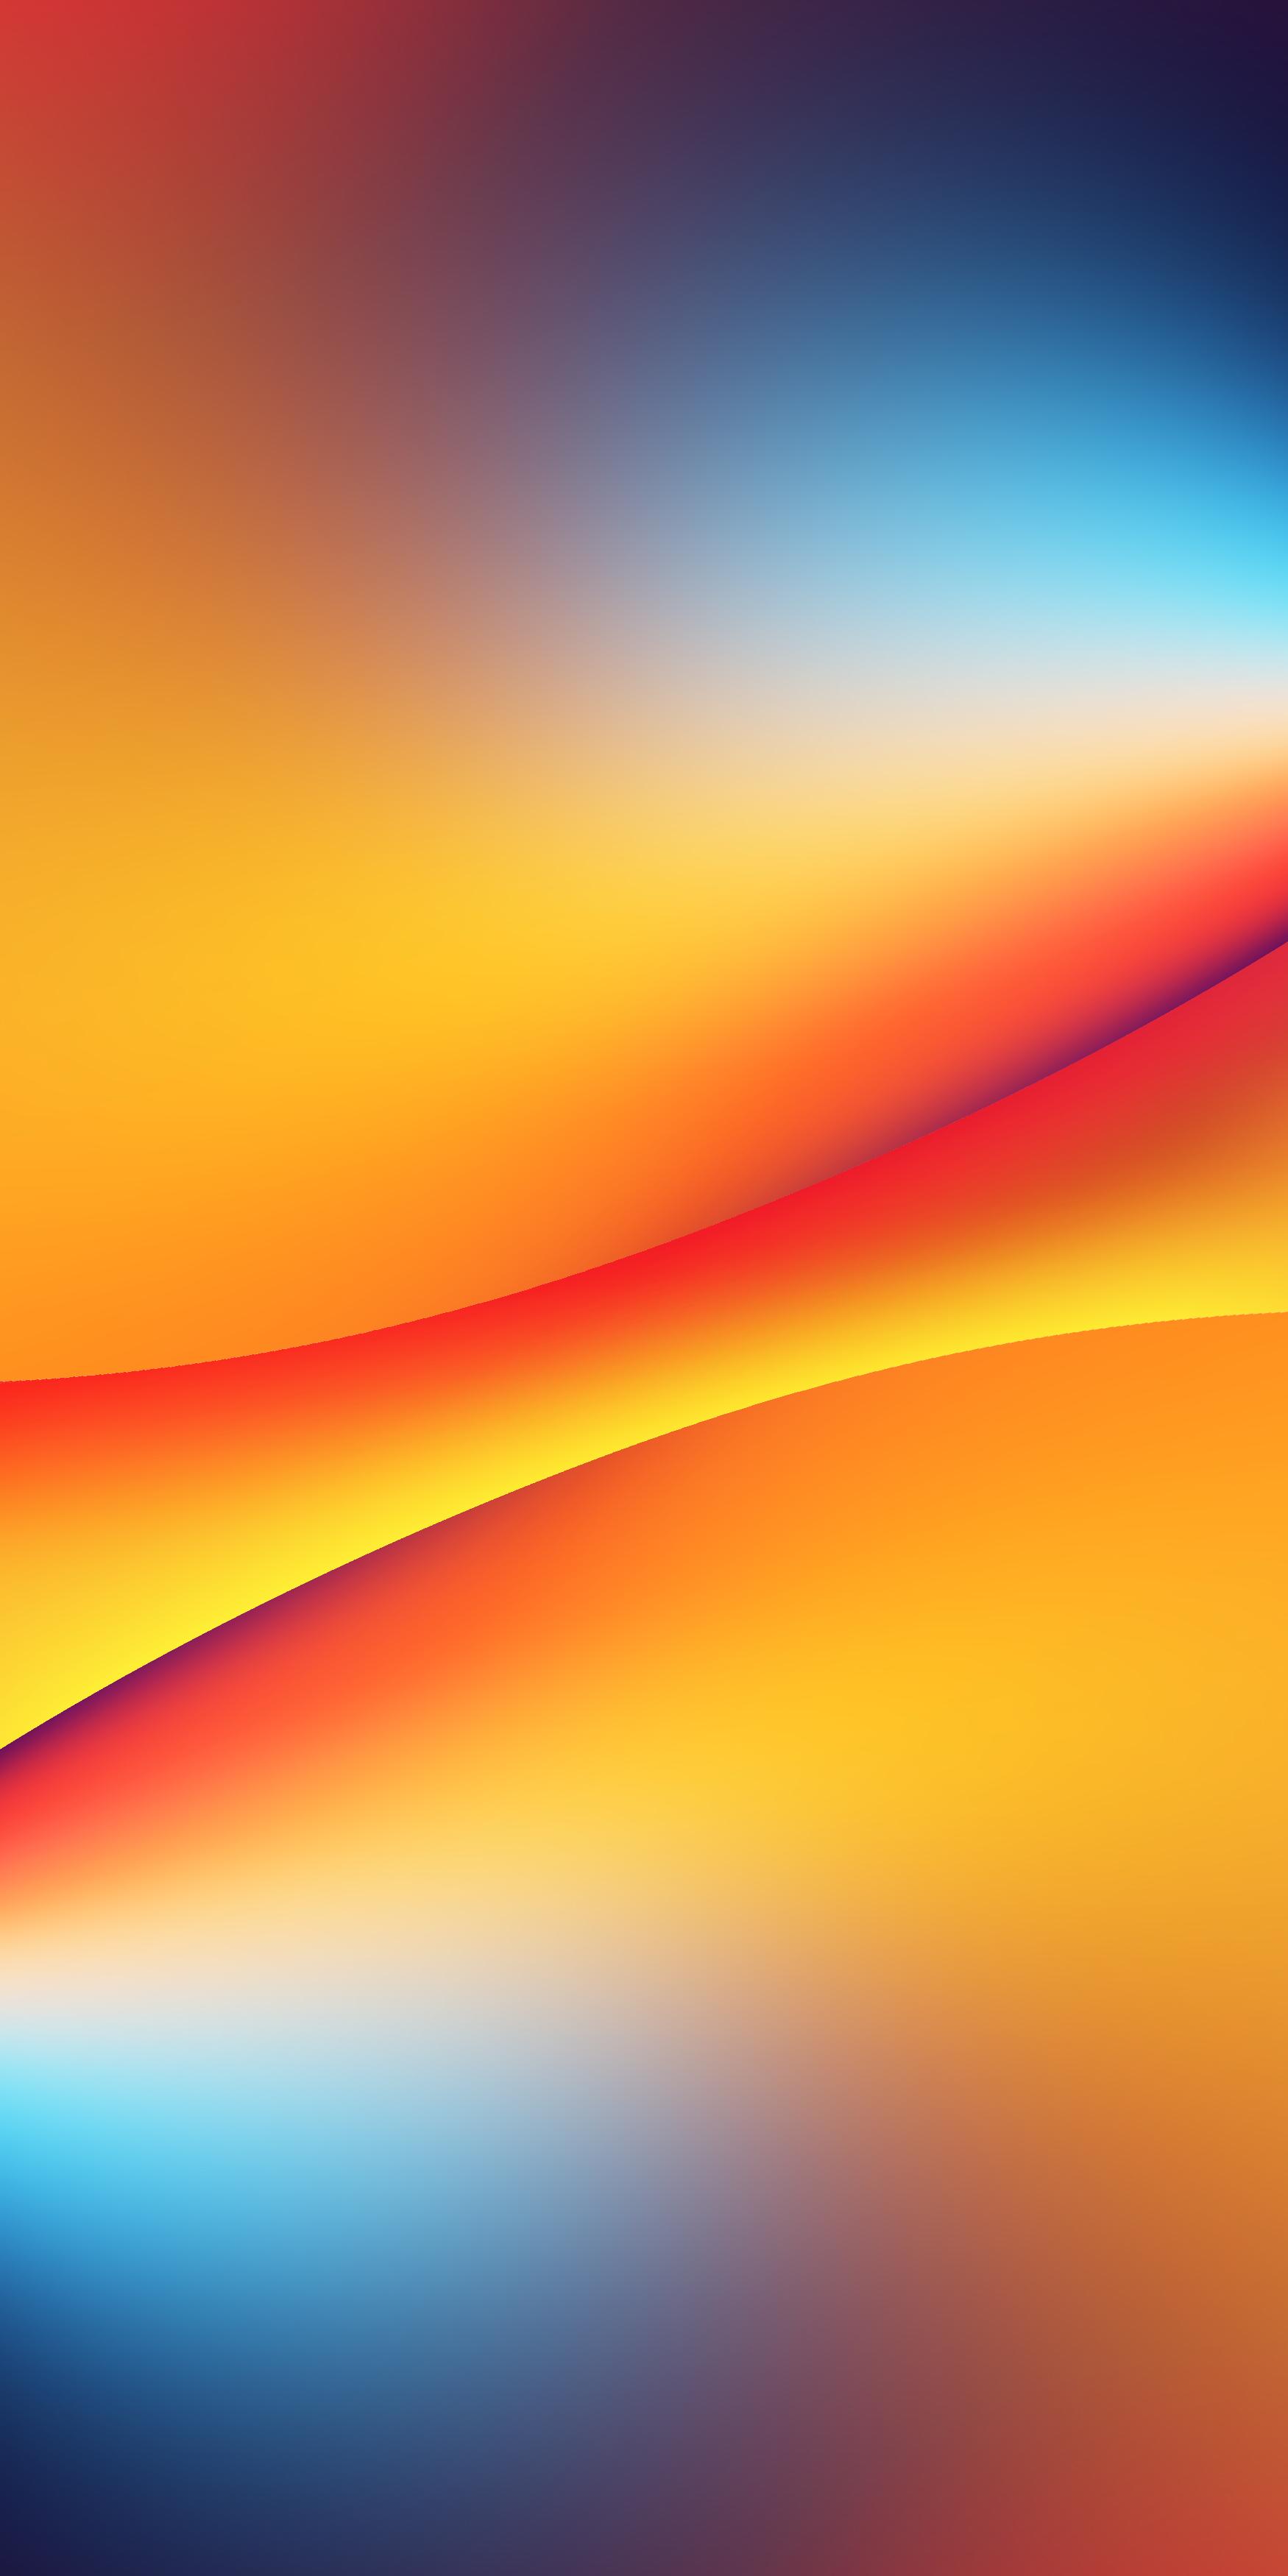 Orange Blue Colorful Nebula Illustration Nebula Wallpaper Nebula Outer Space Wallpaper